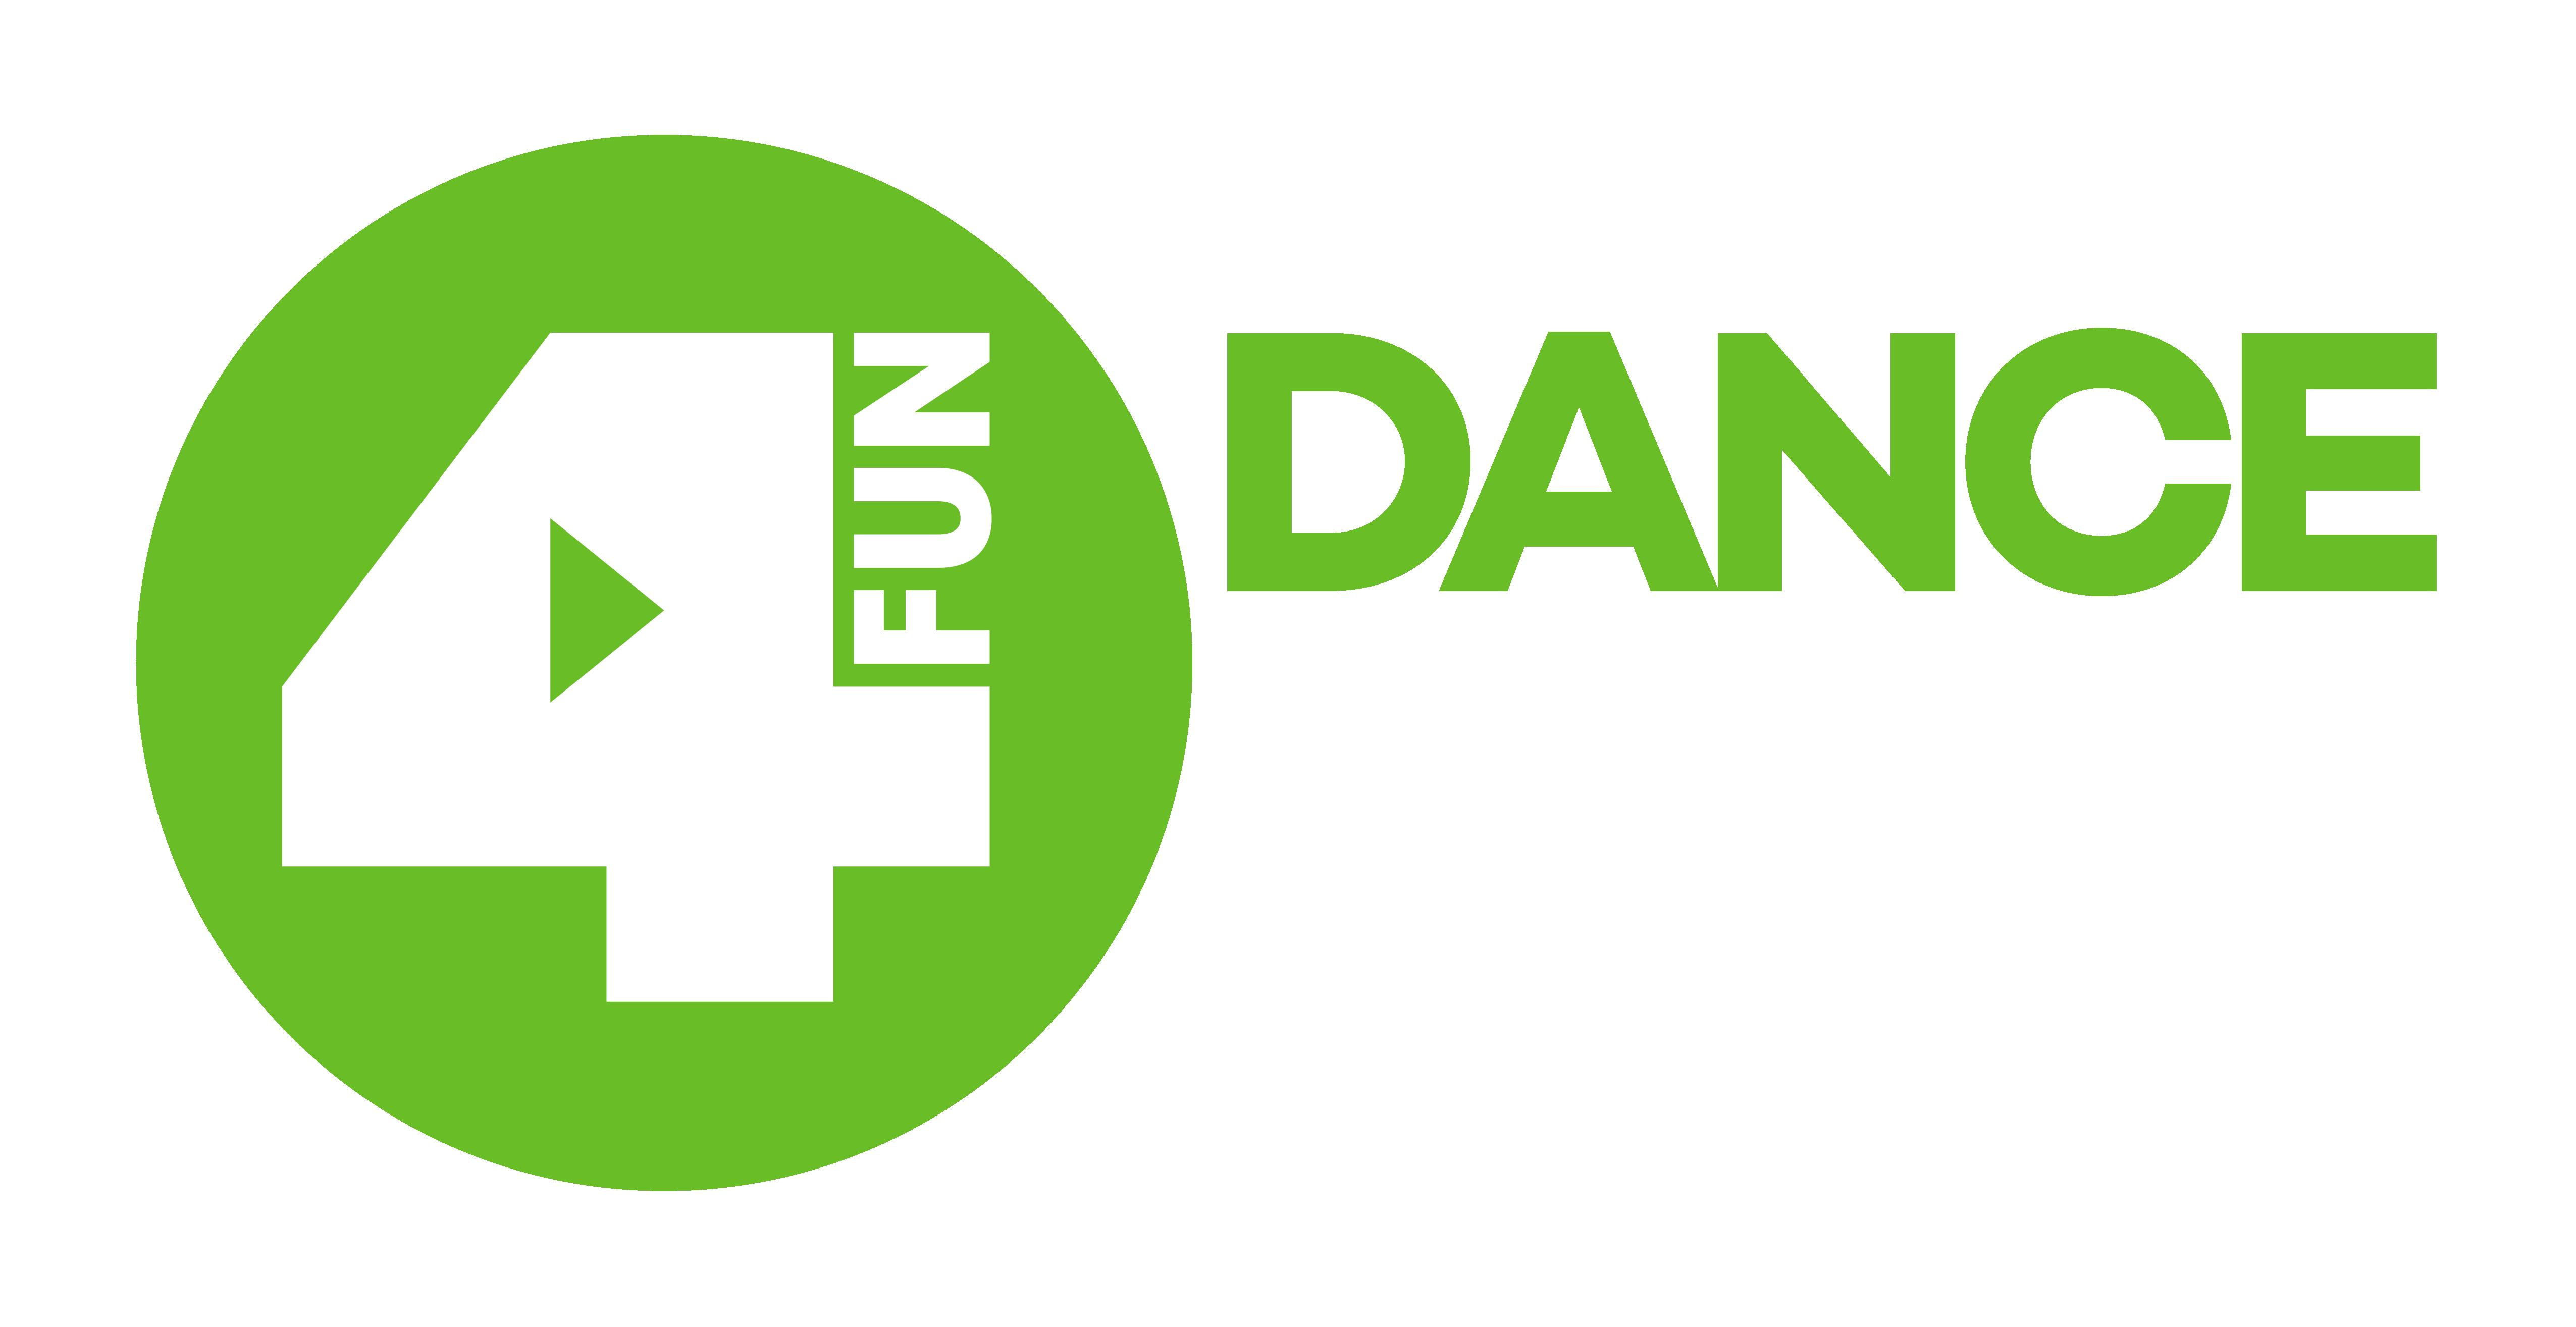 File:4FUN DANCE.png